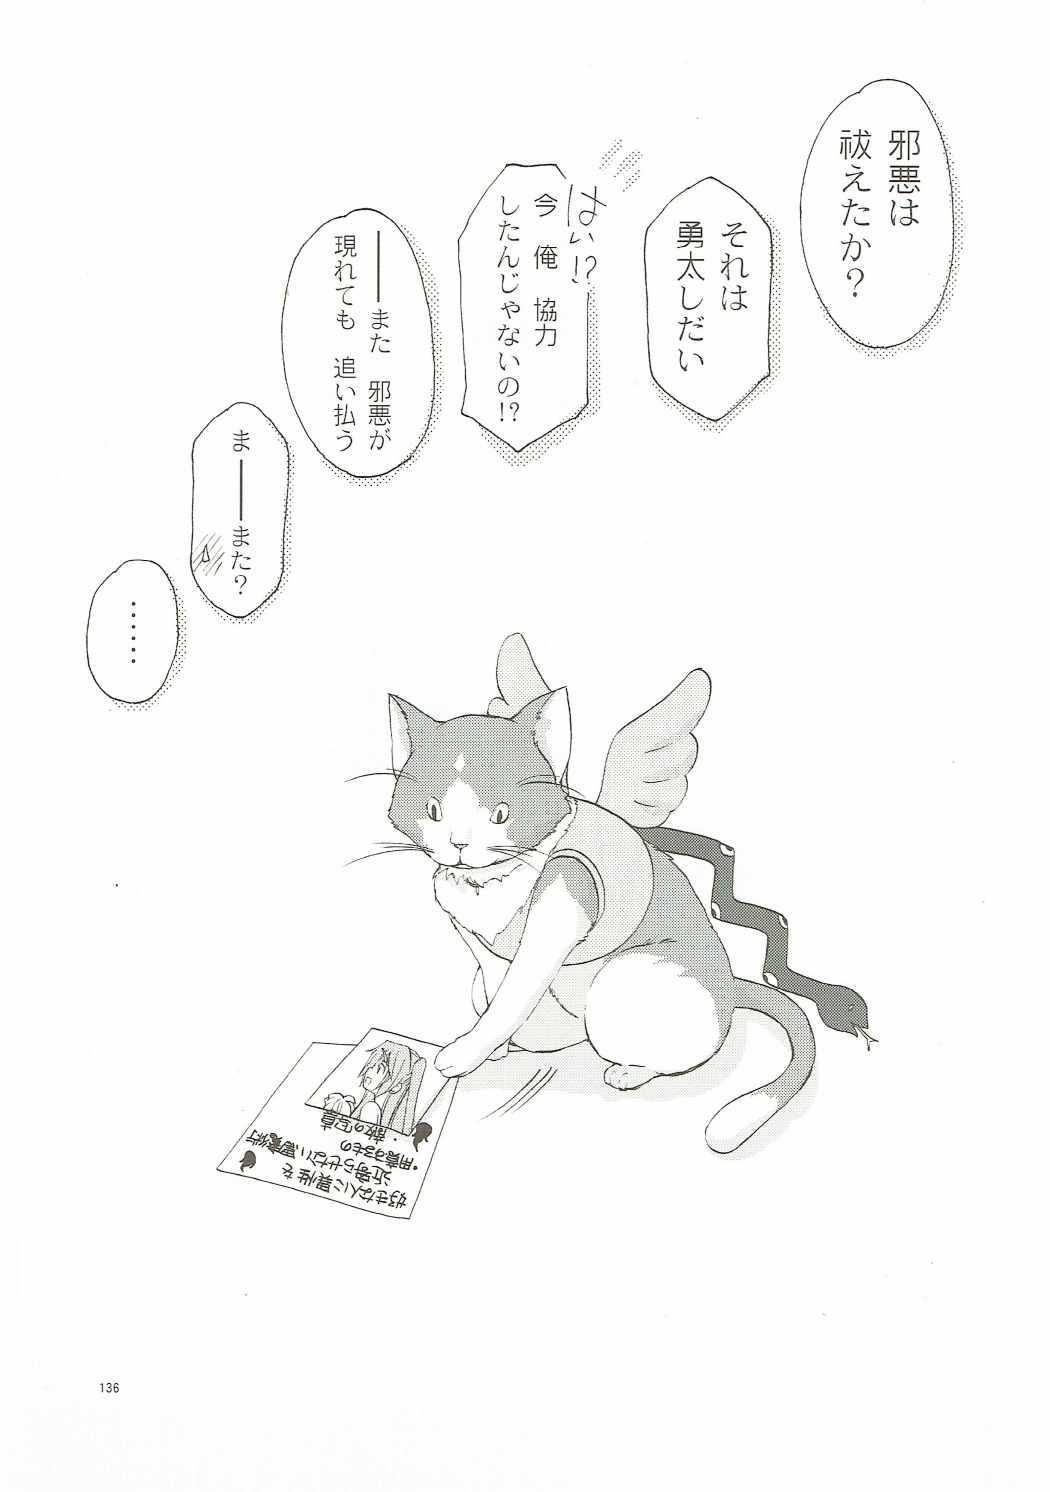 ANIME COLLECTION Imomuya Honpo - Singleton Anime Soushuuhen 134